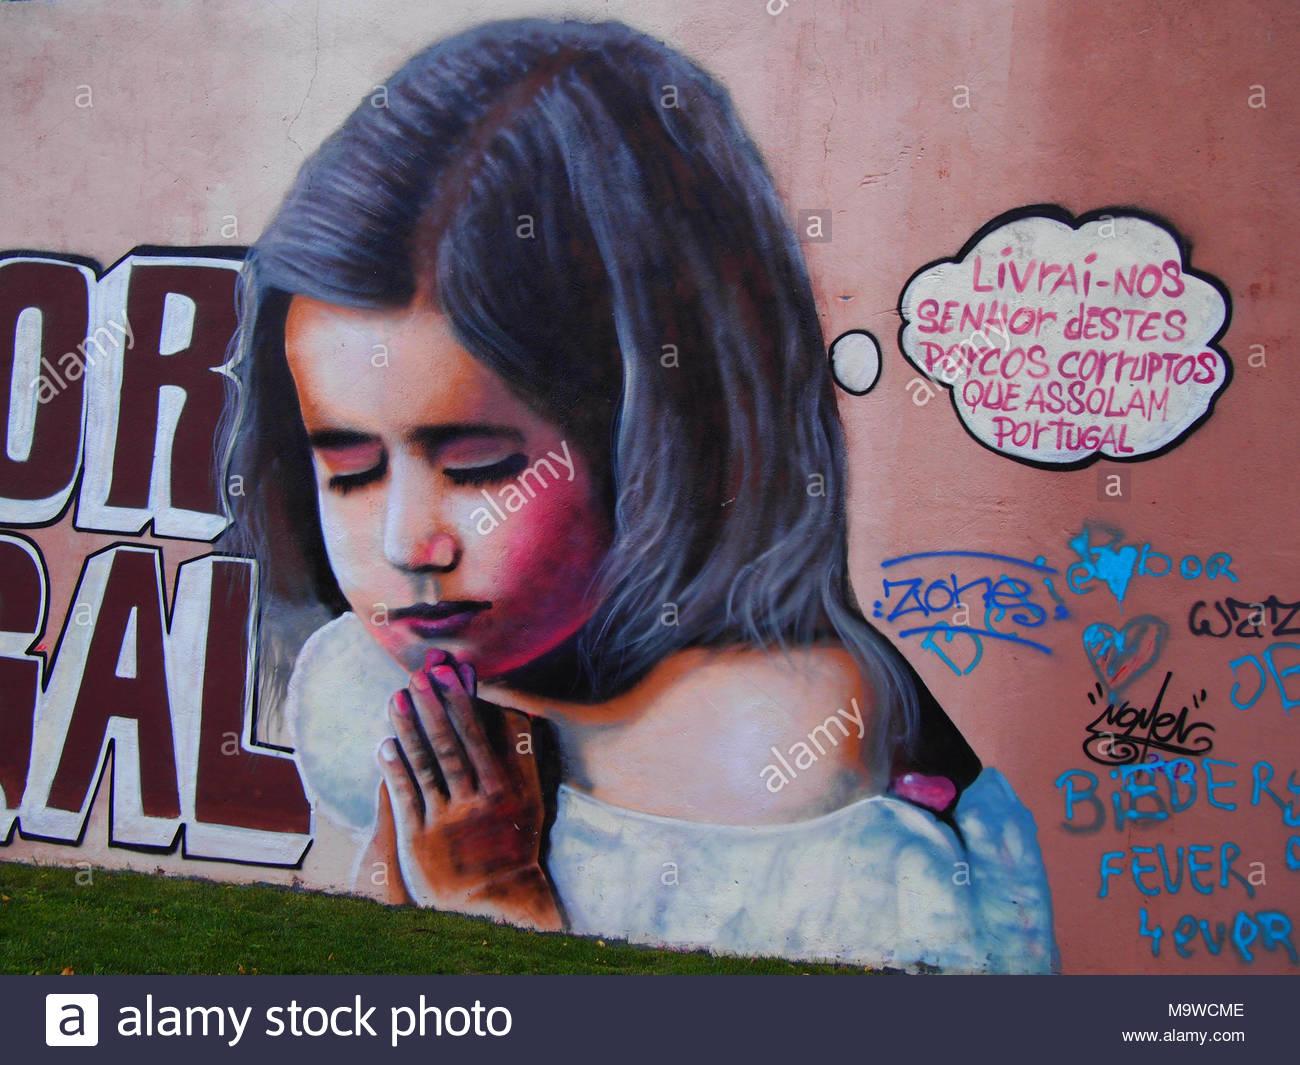 Thriving urban graffiti and street art scene in Lisbon, 2014 - Stock Image